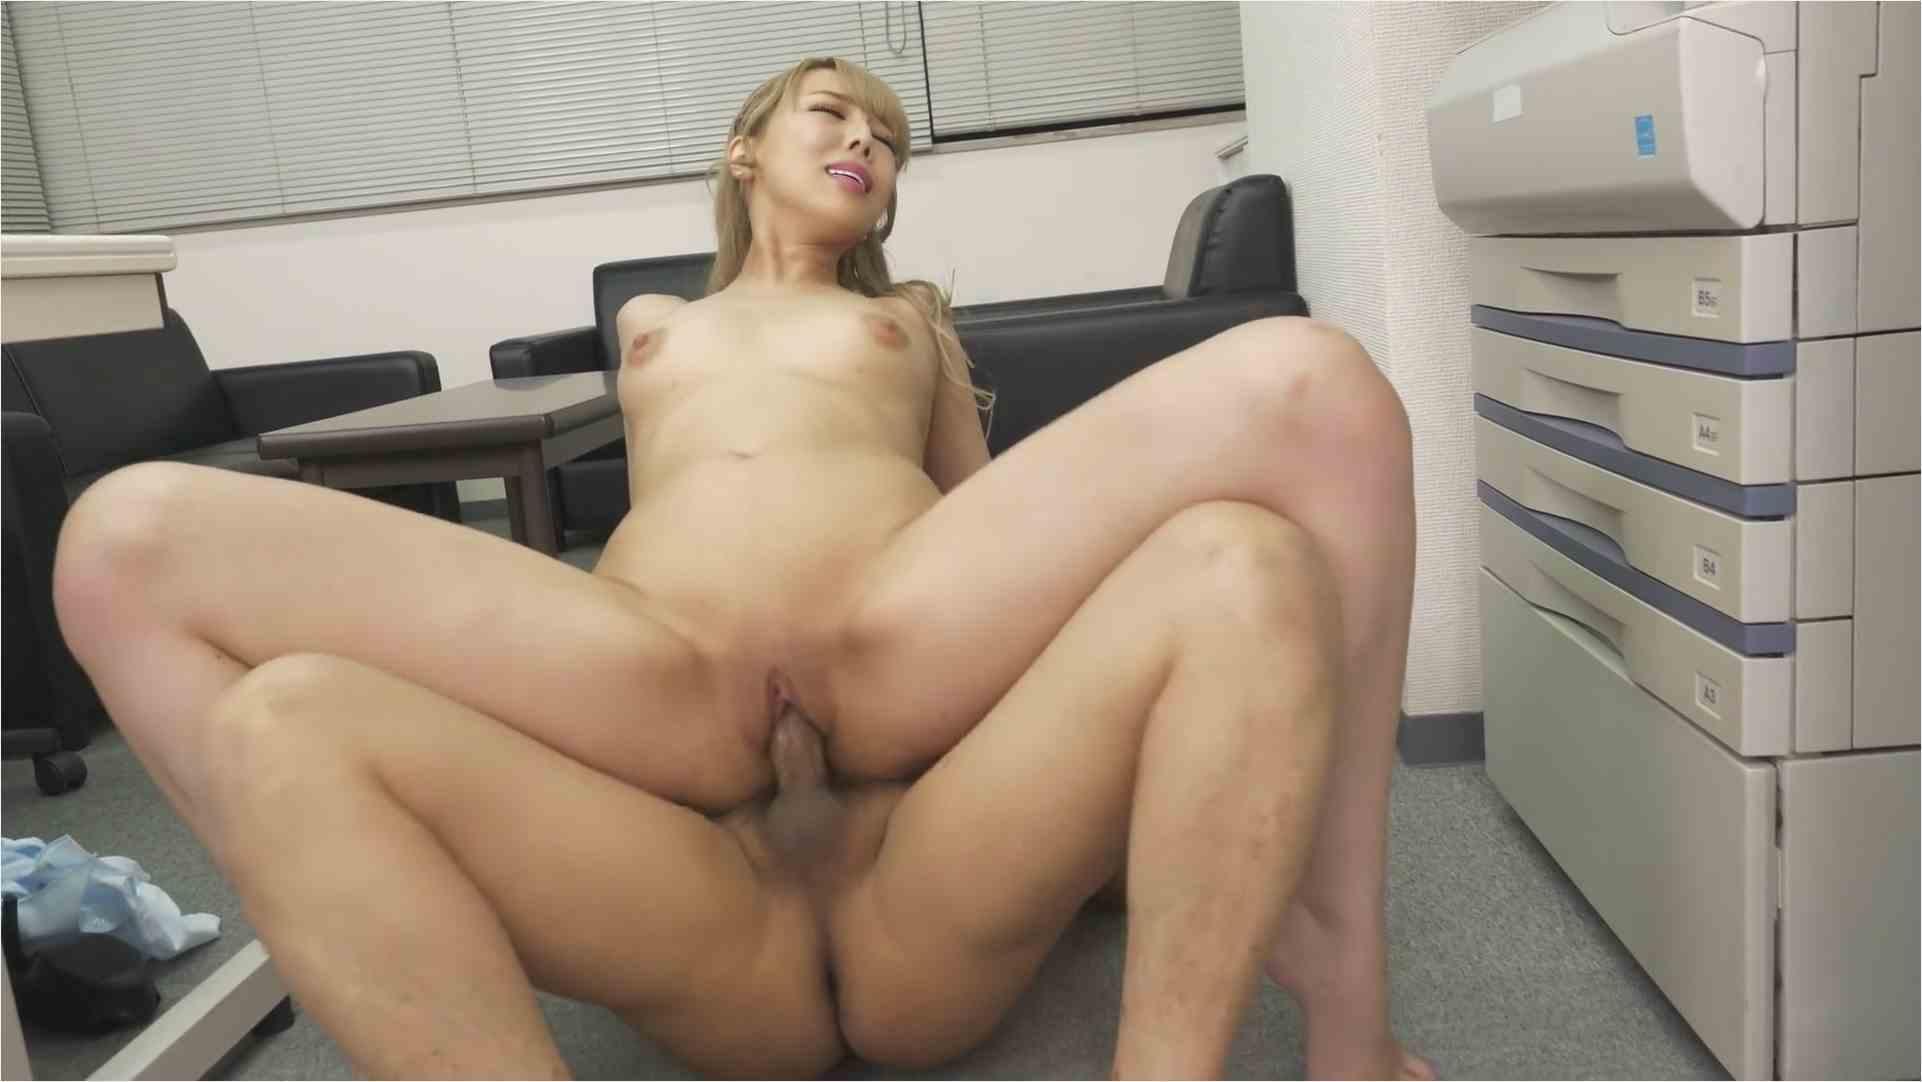 Heyzo-1890-ケバい女のユルい股~派手目なOLをオフィスでヤる!~